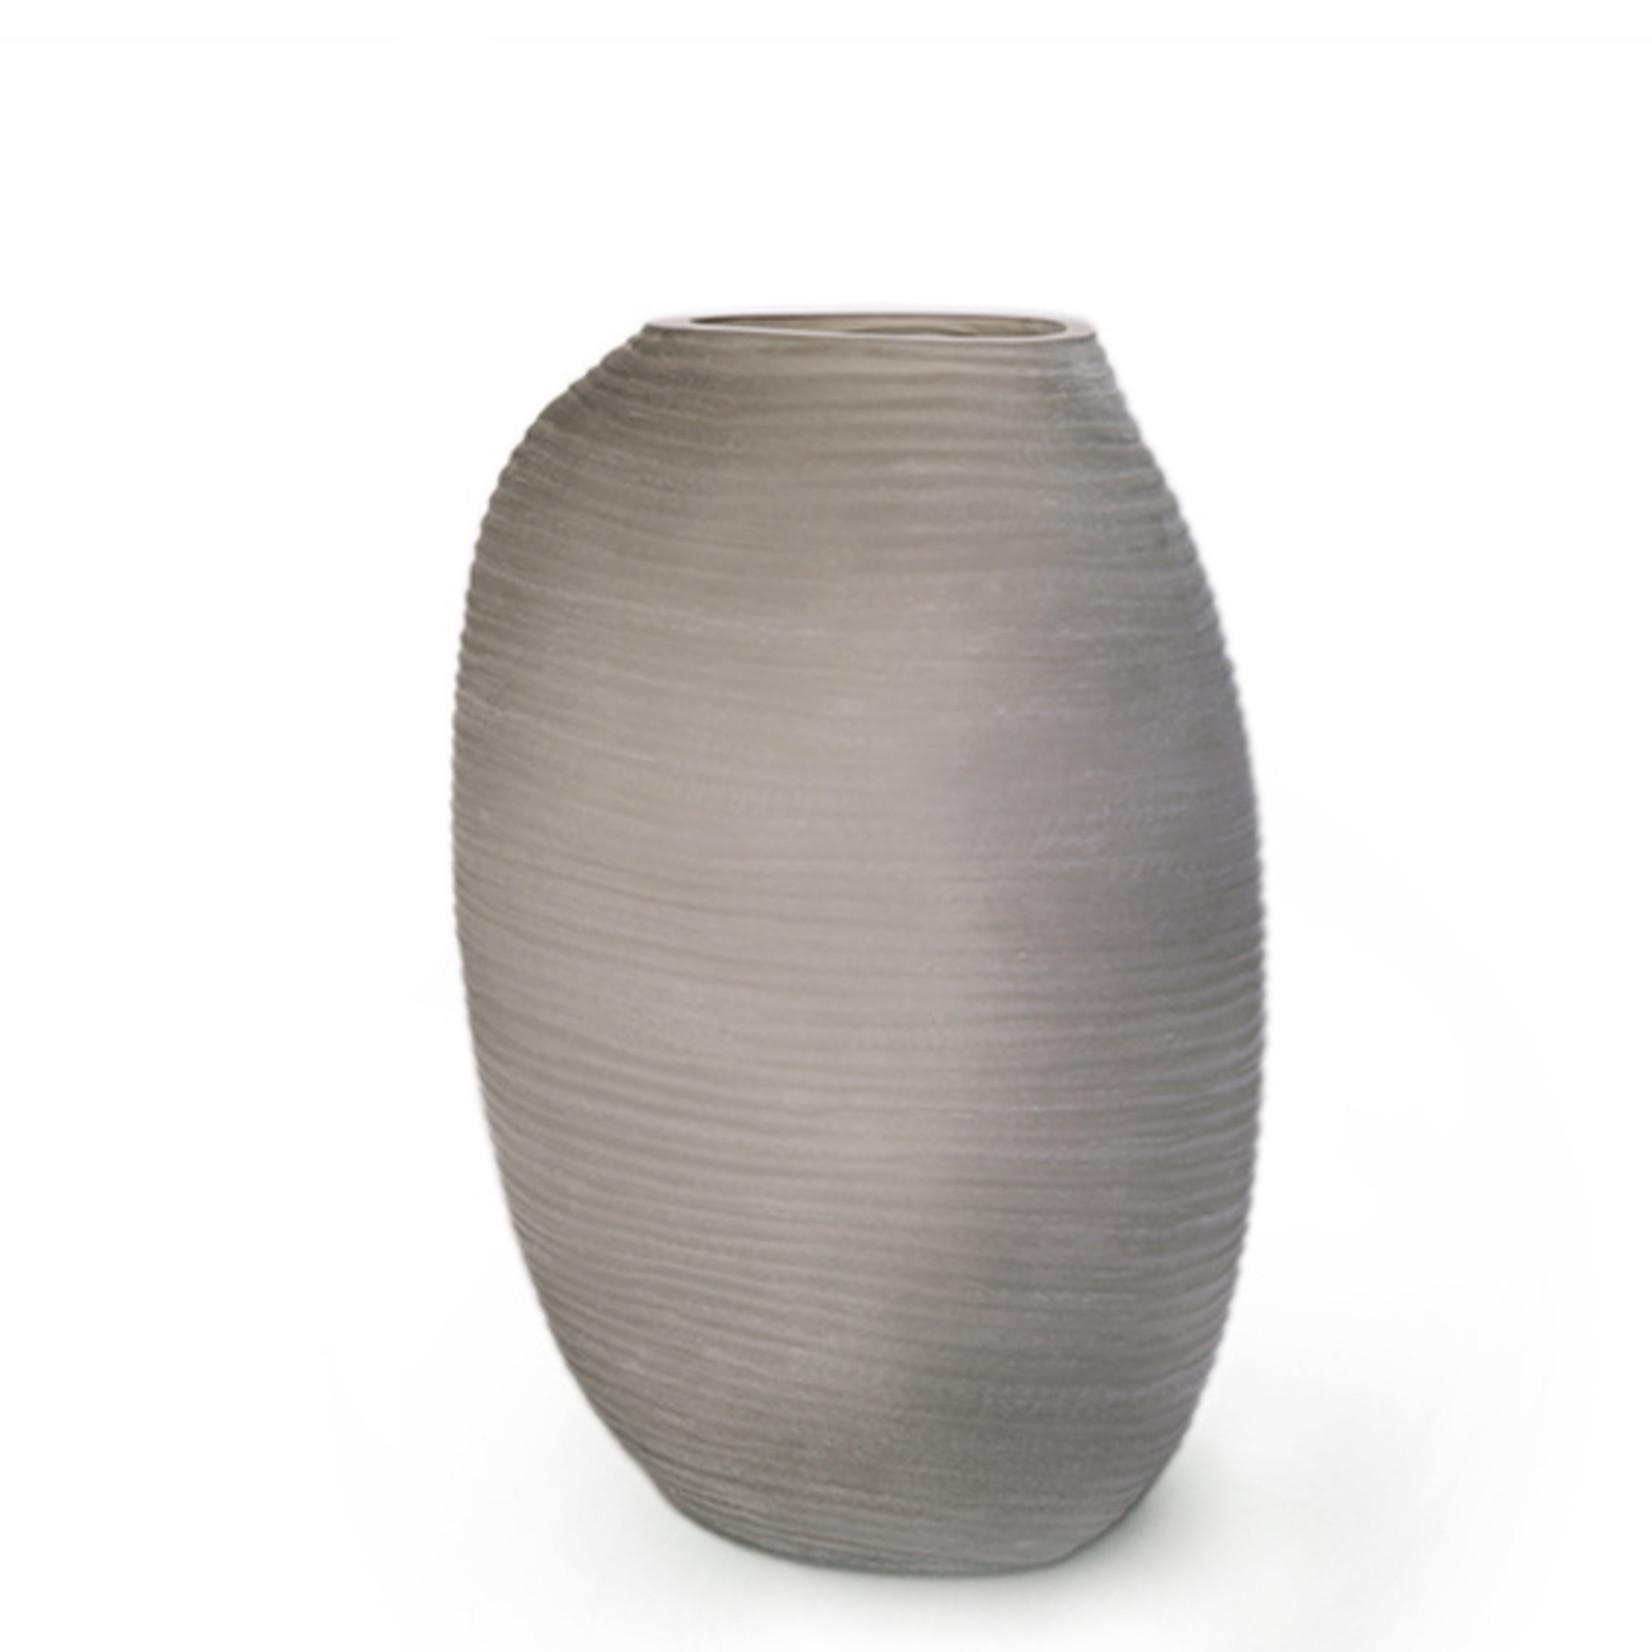 Guaxs Vase Patara Tall   smoke grey